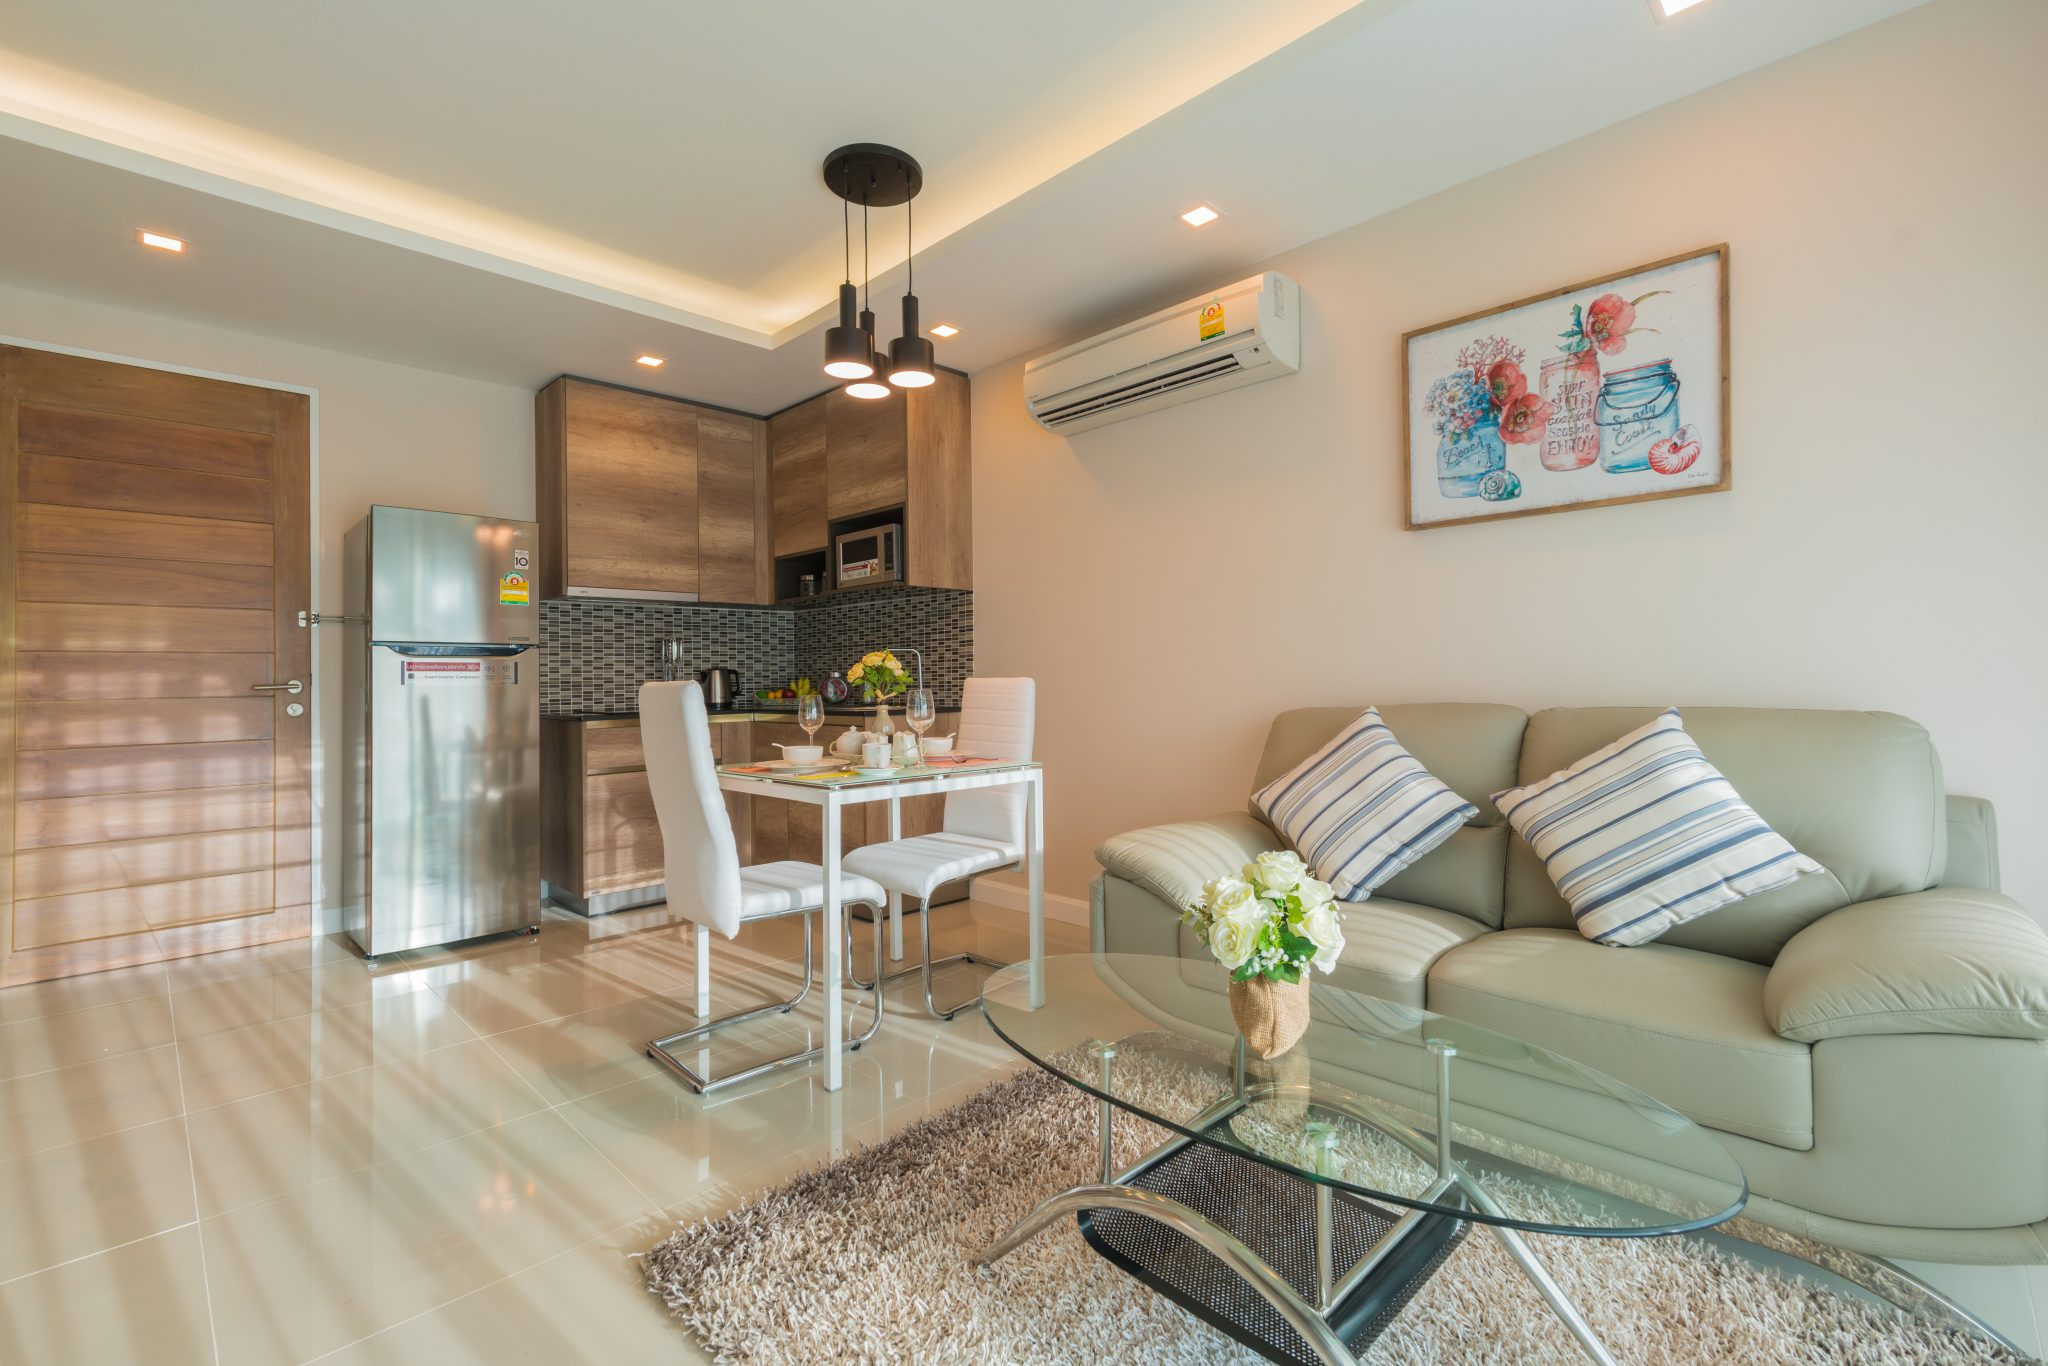 Phuket Real Estate Agency – Rawai Beach (1)